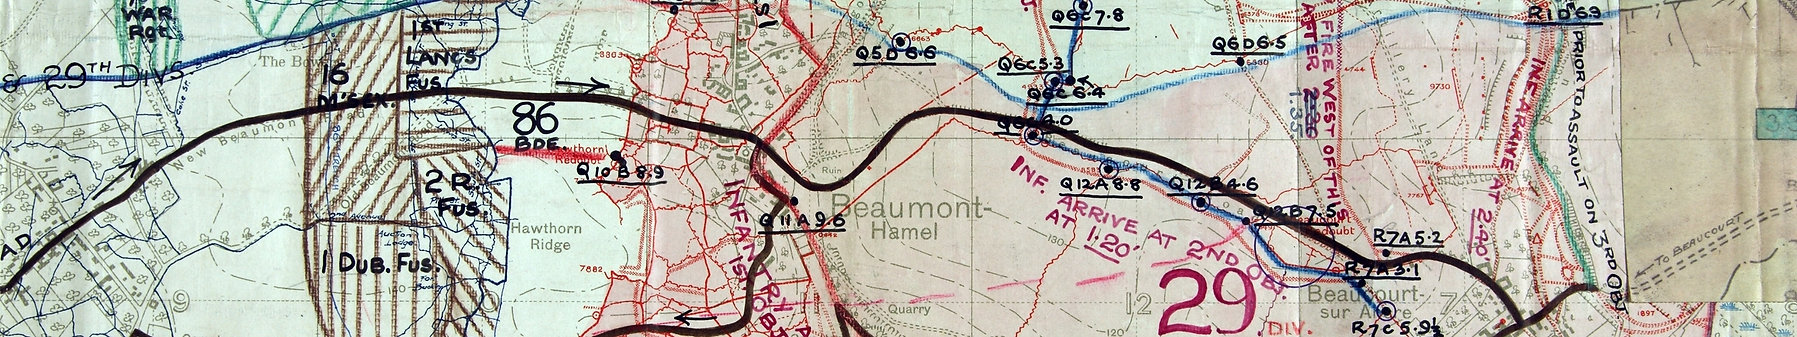 Hawthorn Ridge and Crater WW1